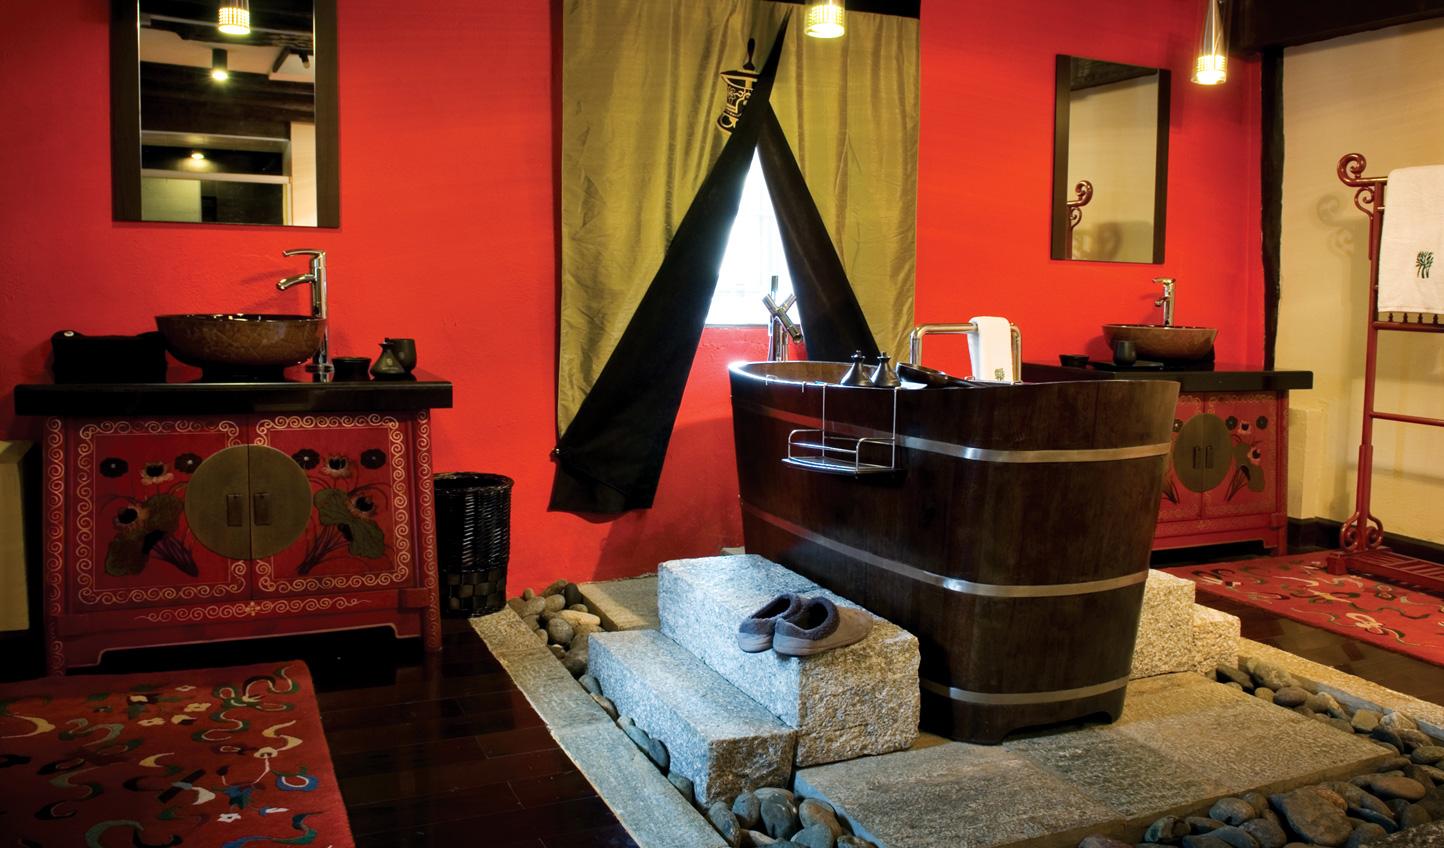 Soak your stresses away in a deep Tibetan bathtub